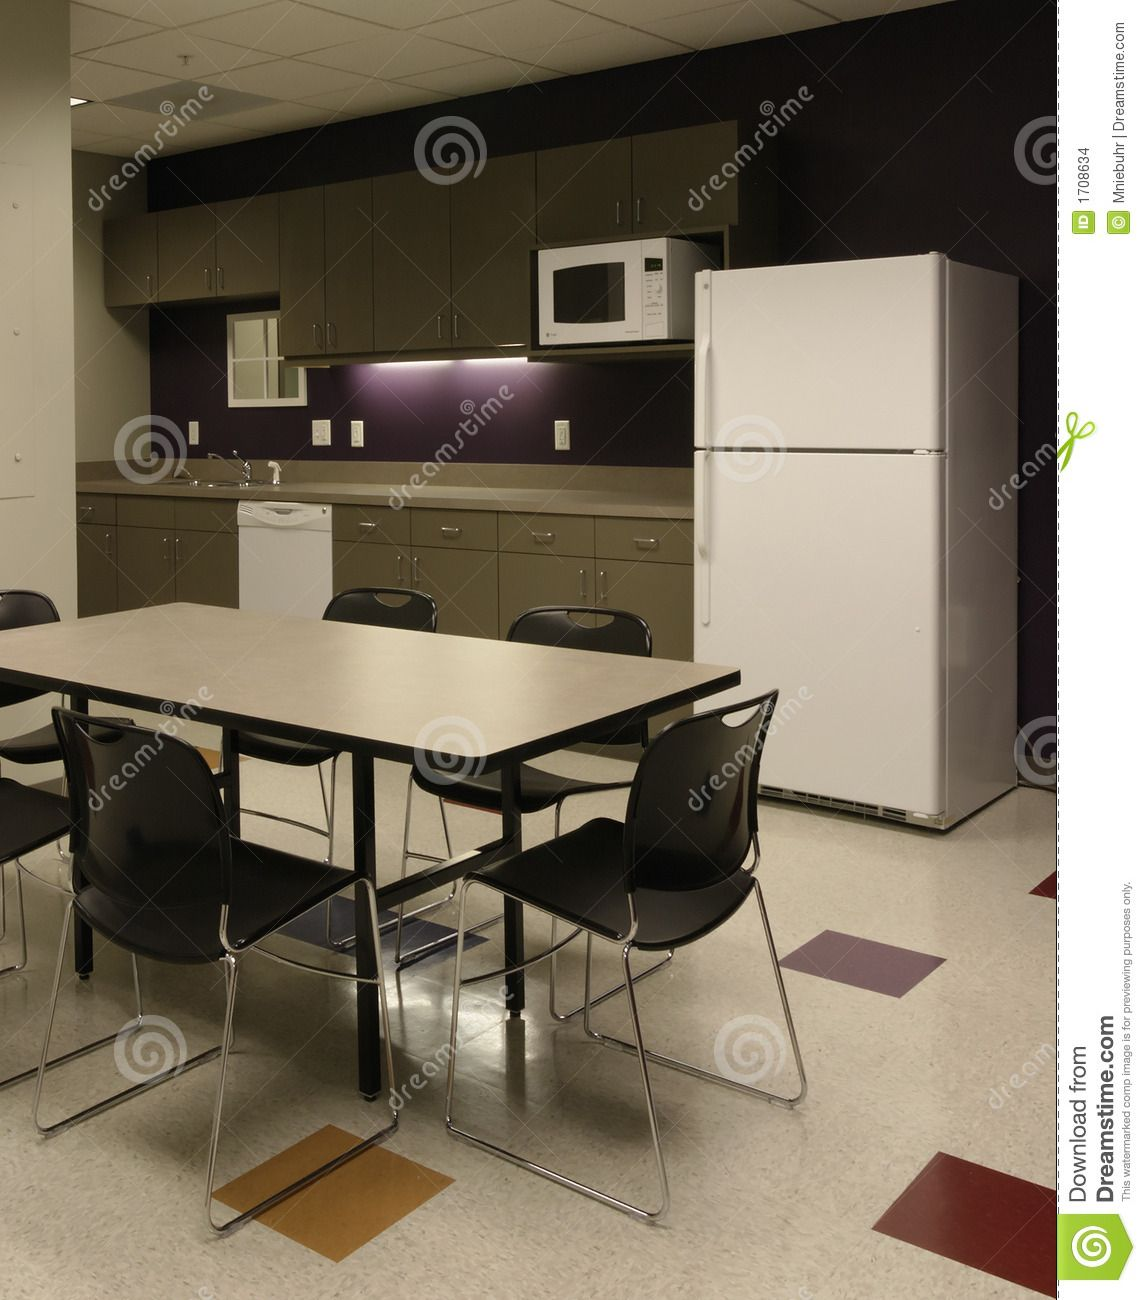 Image Result For Employee Break Room Kitchen Office Break Room